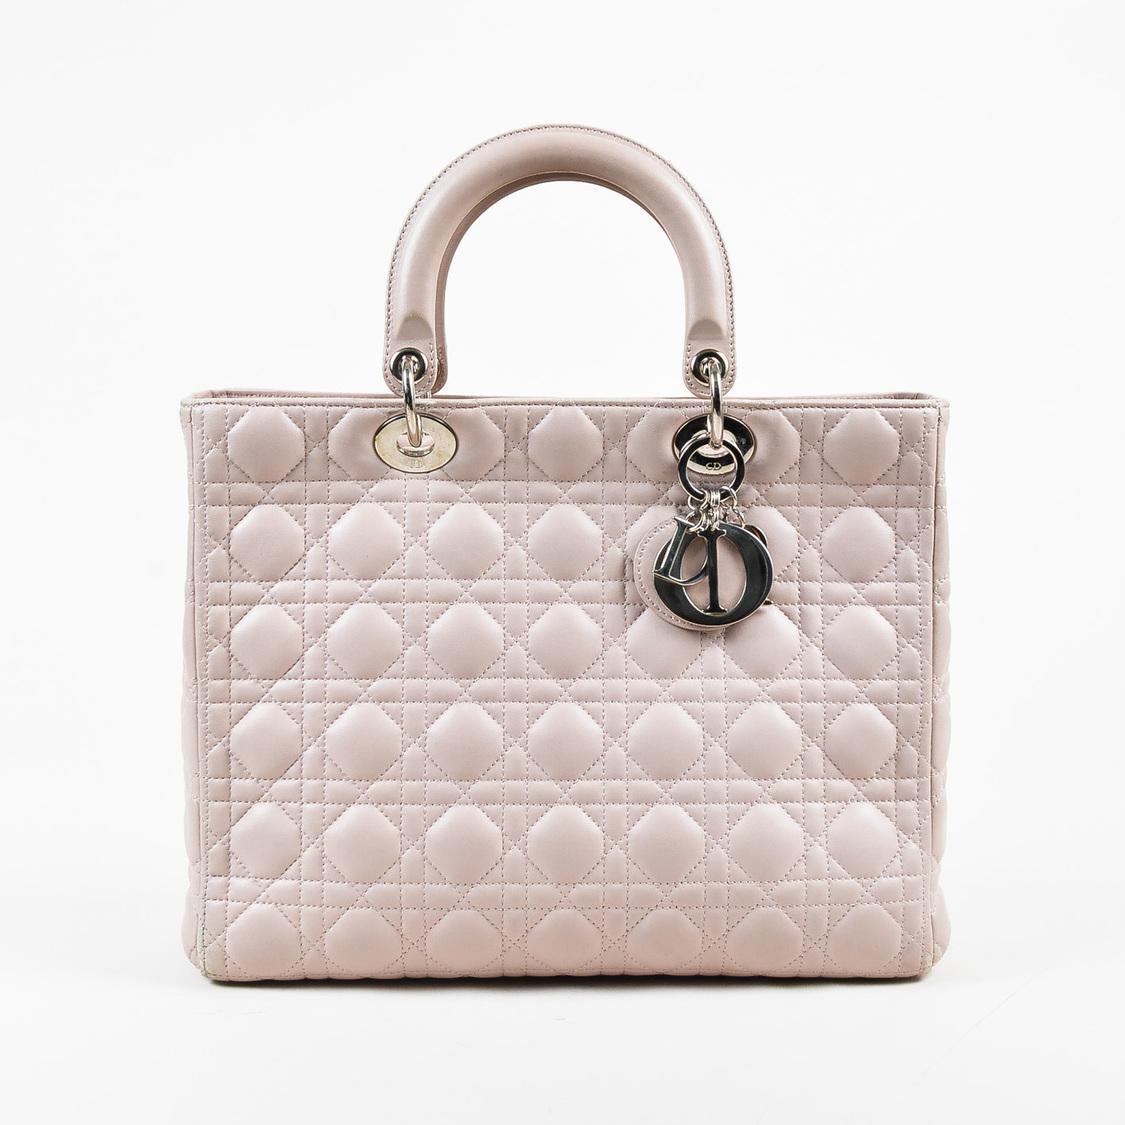 66dc1eedd817 Lyst - Dior Pink Lambskin